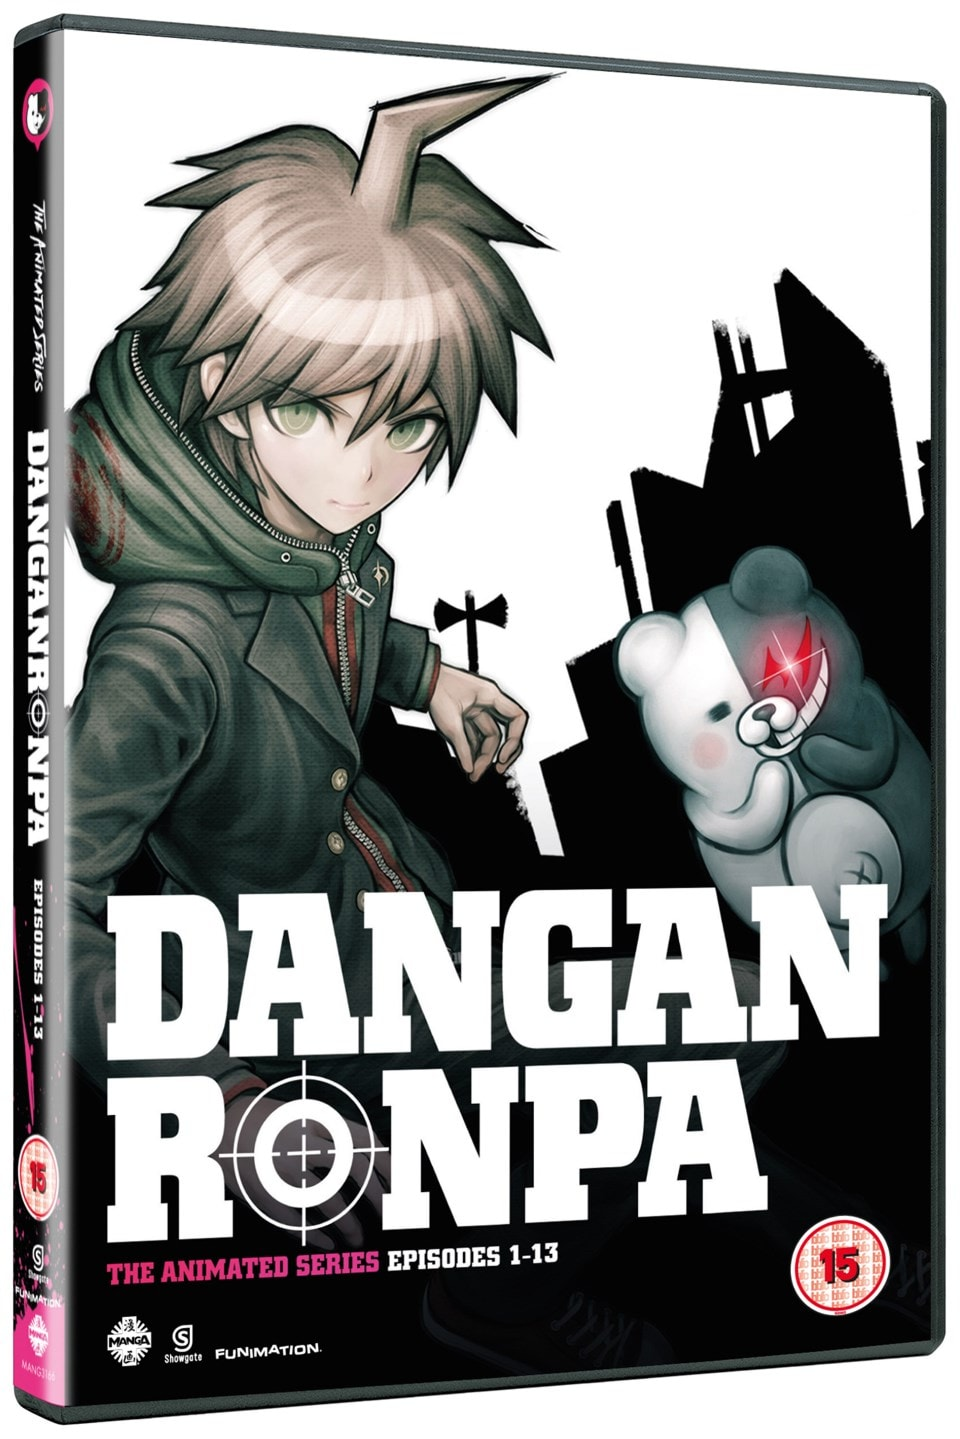 Danganronpa the Animation: Complete Season Collection - 1